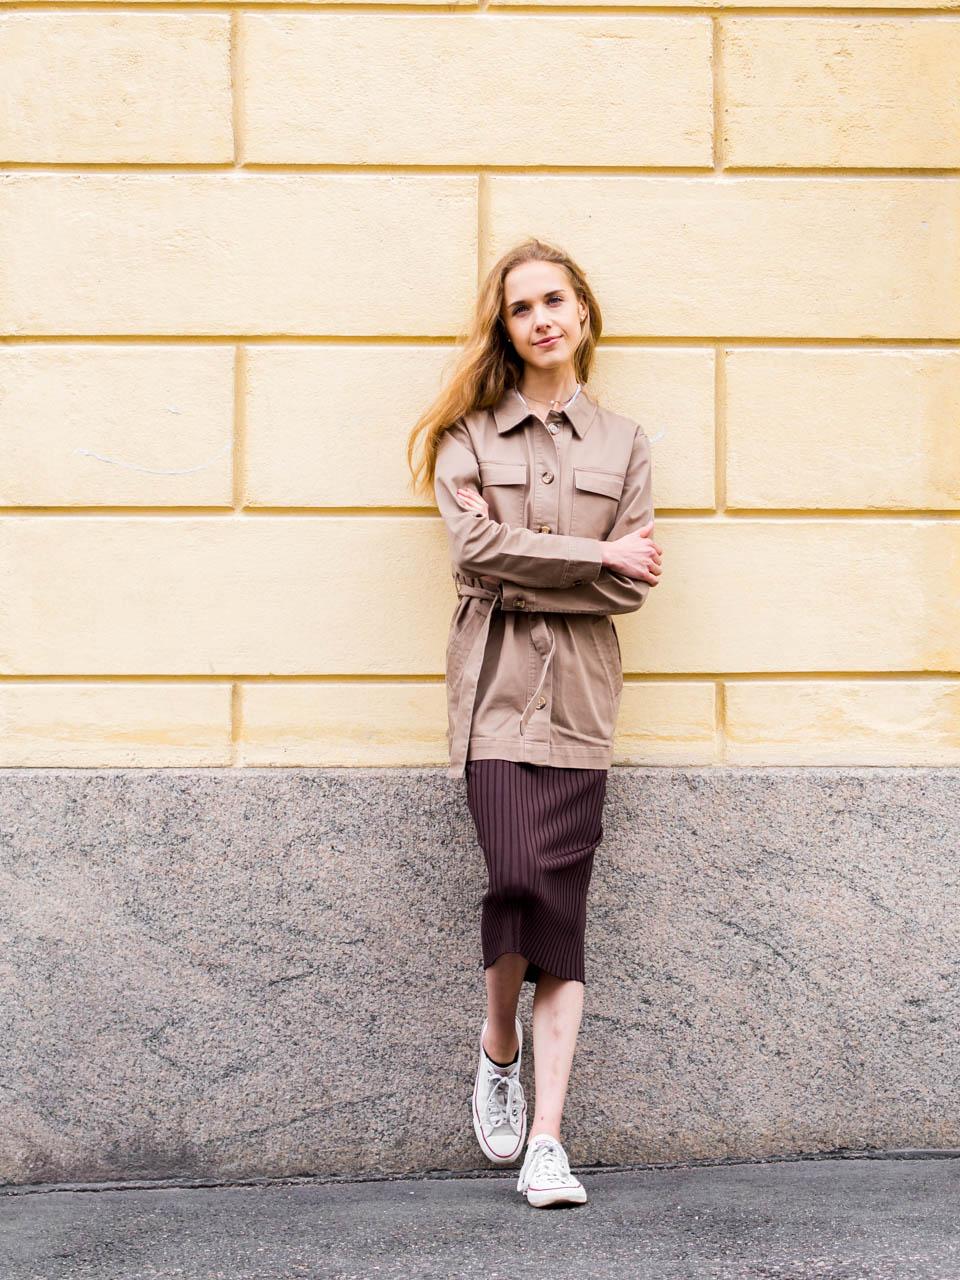 fashion-blogger-utility-trend-warm-beige-muotiblogi-asuinspiraatio-syysmuoti-utility